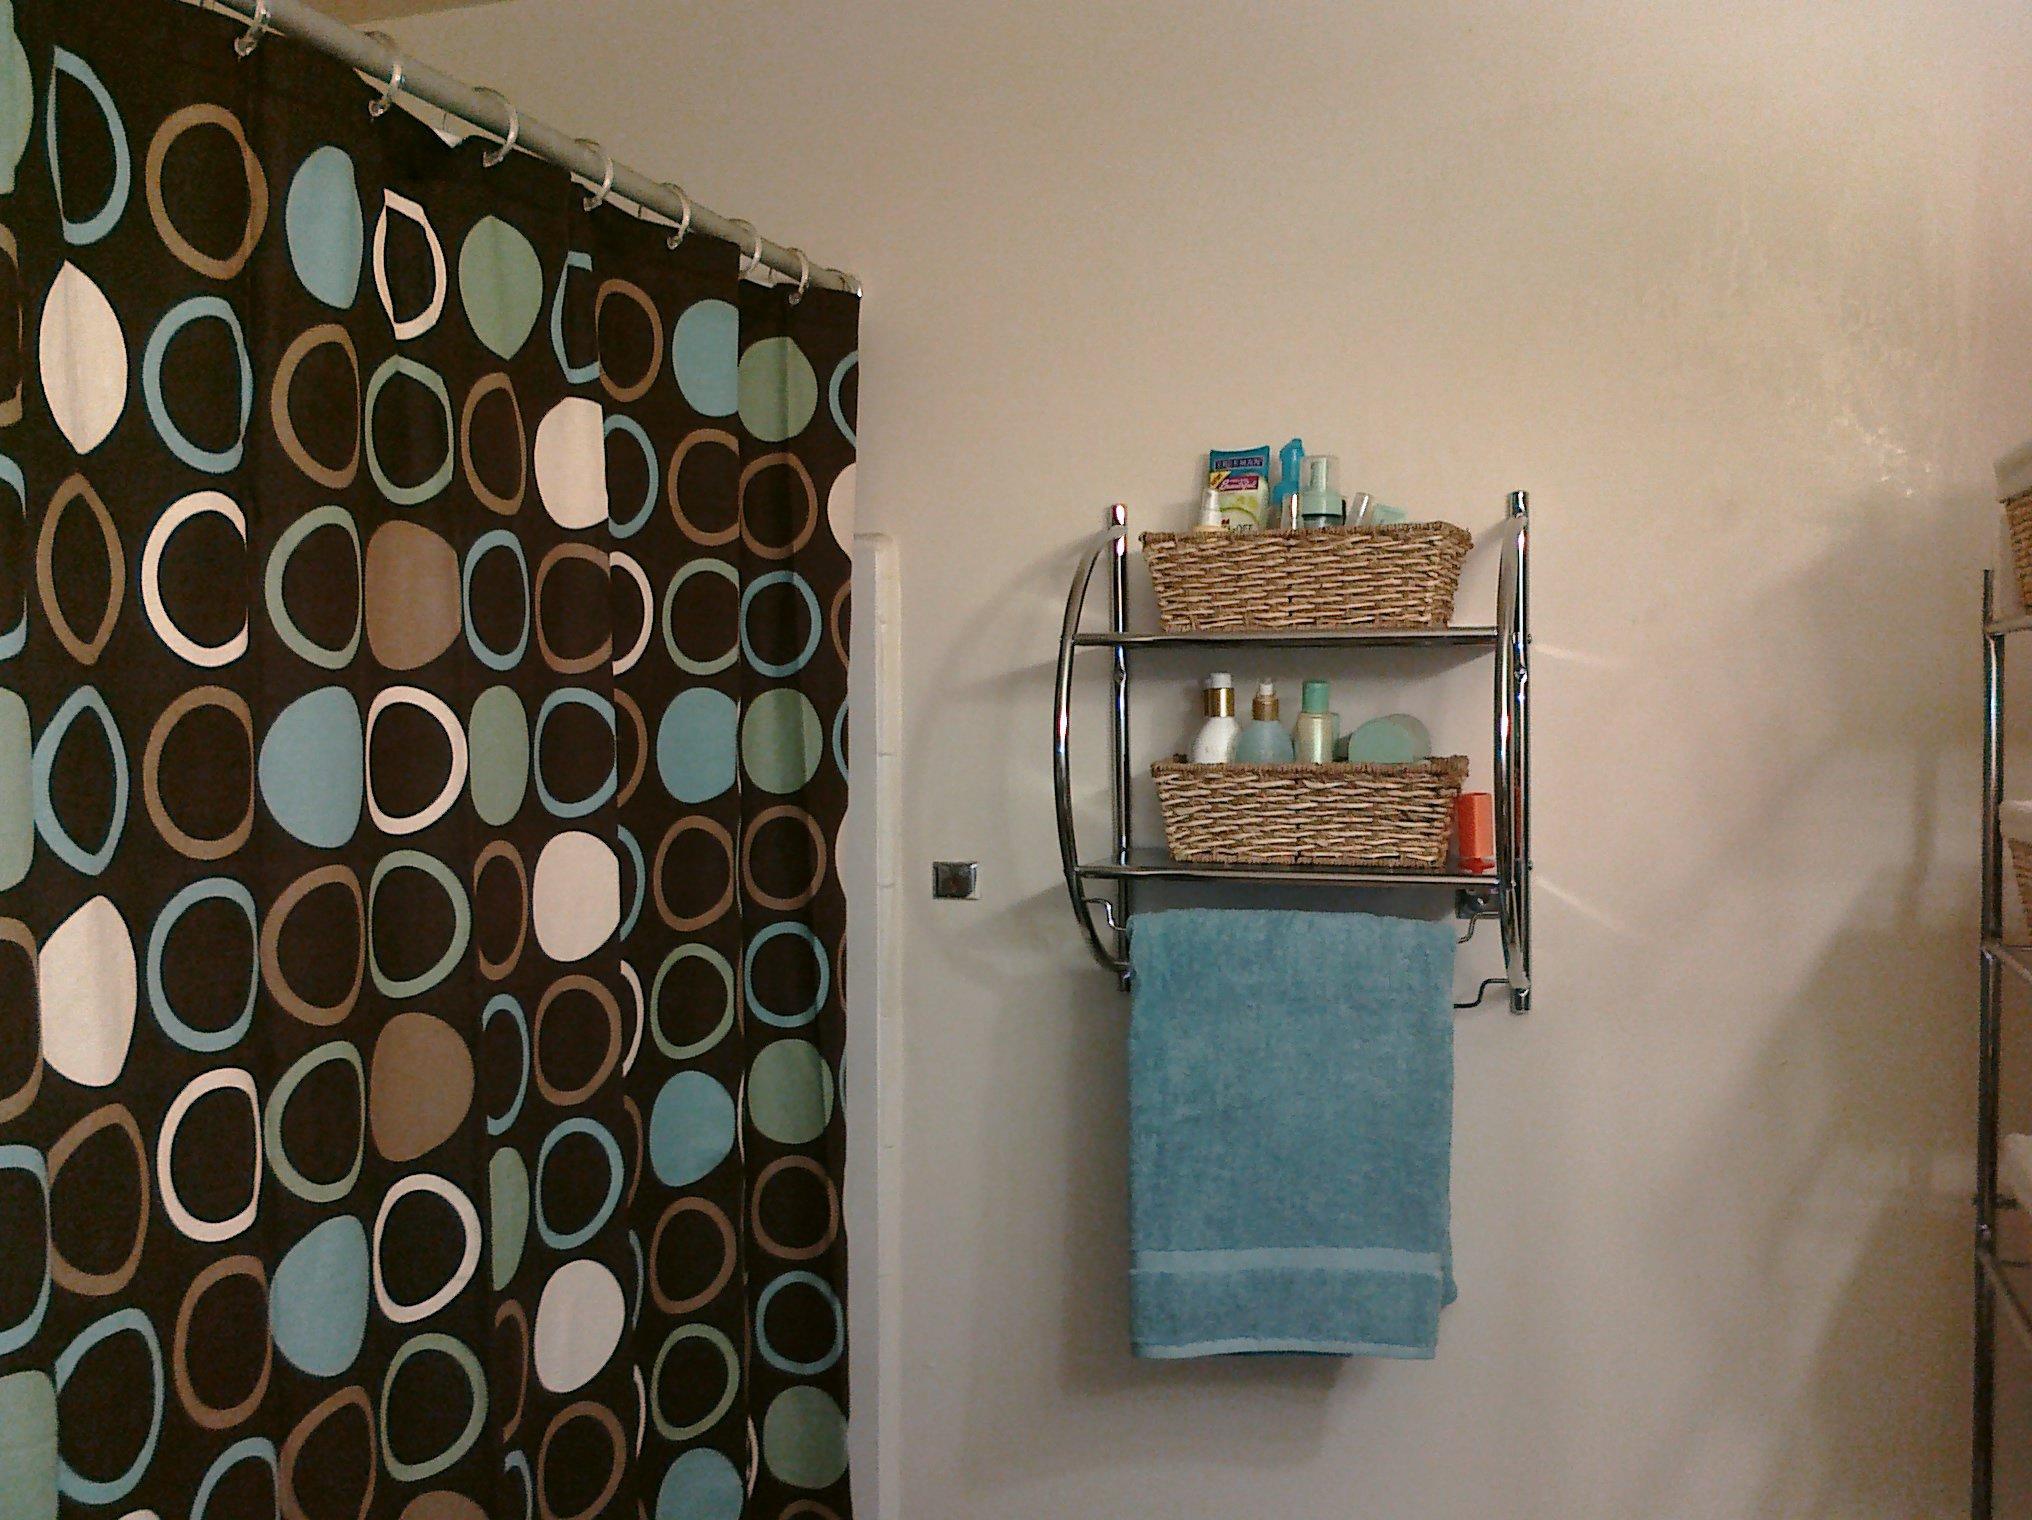 Bedroom redecorating ghentstreets design notes for Redecorating bathroom ideas